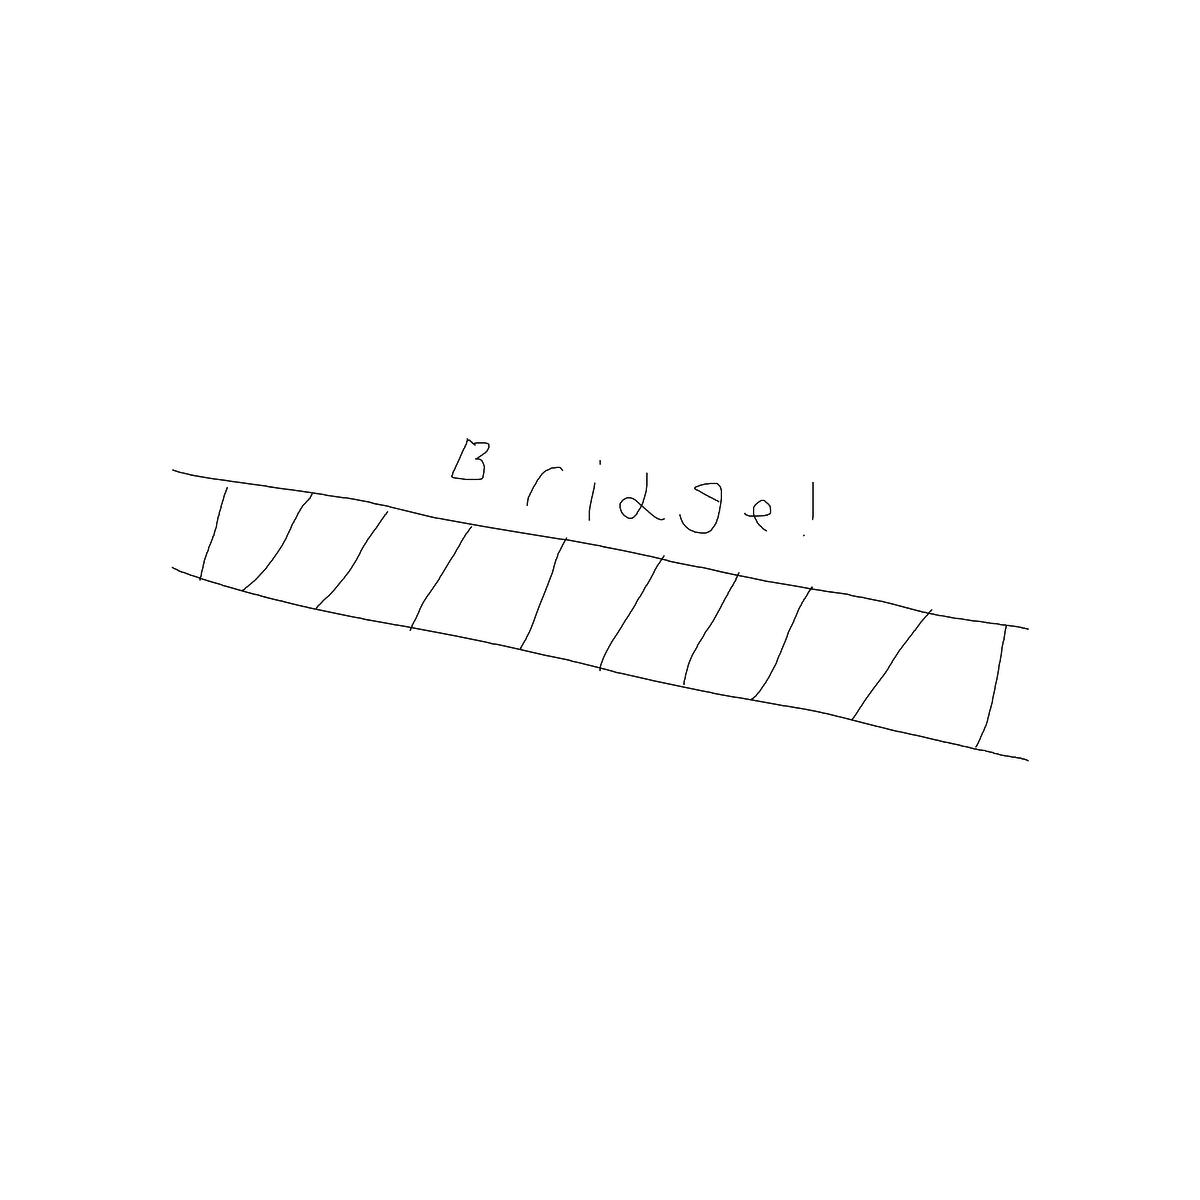 BAAAM drawing#23339 lat:66.0171356201171900lng: -169.7068328857422000